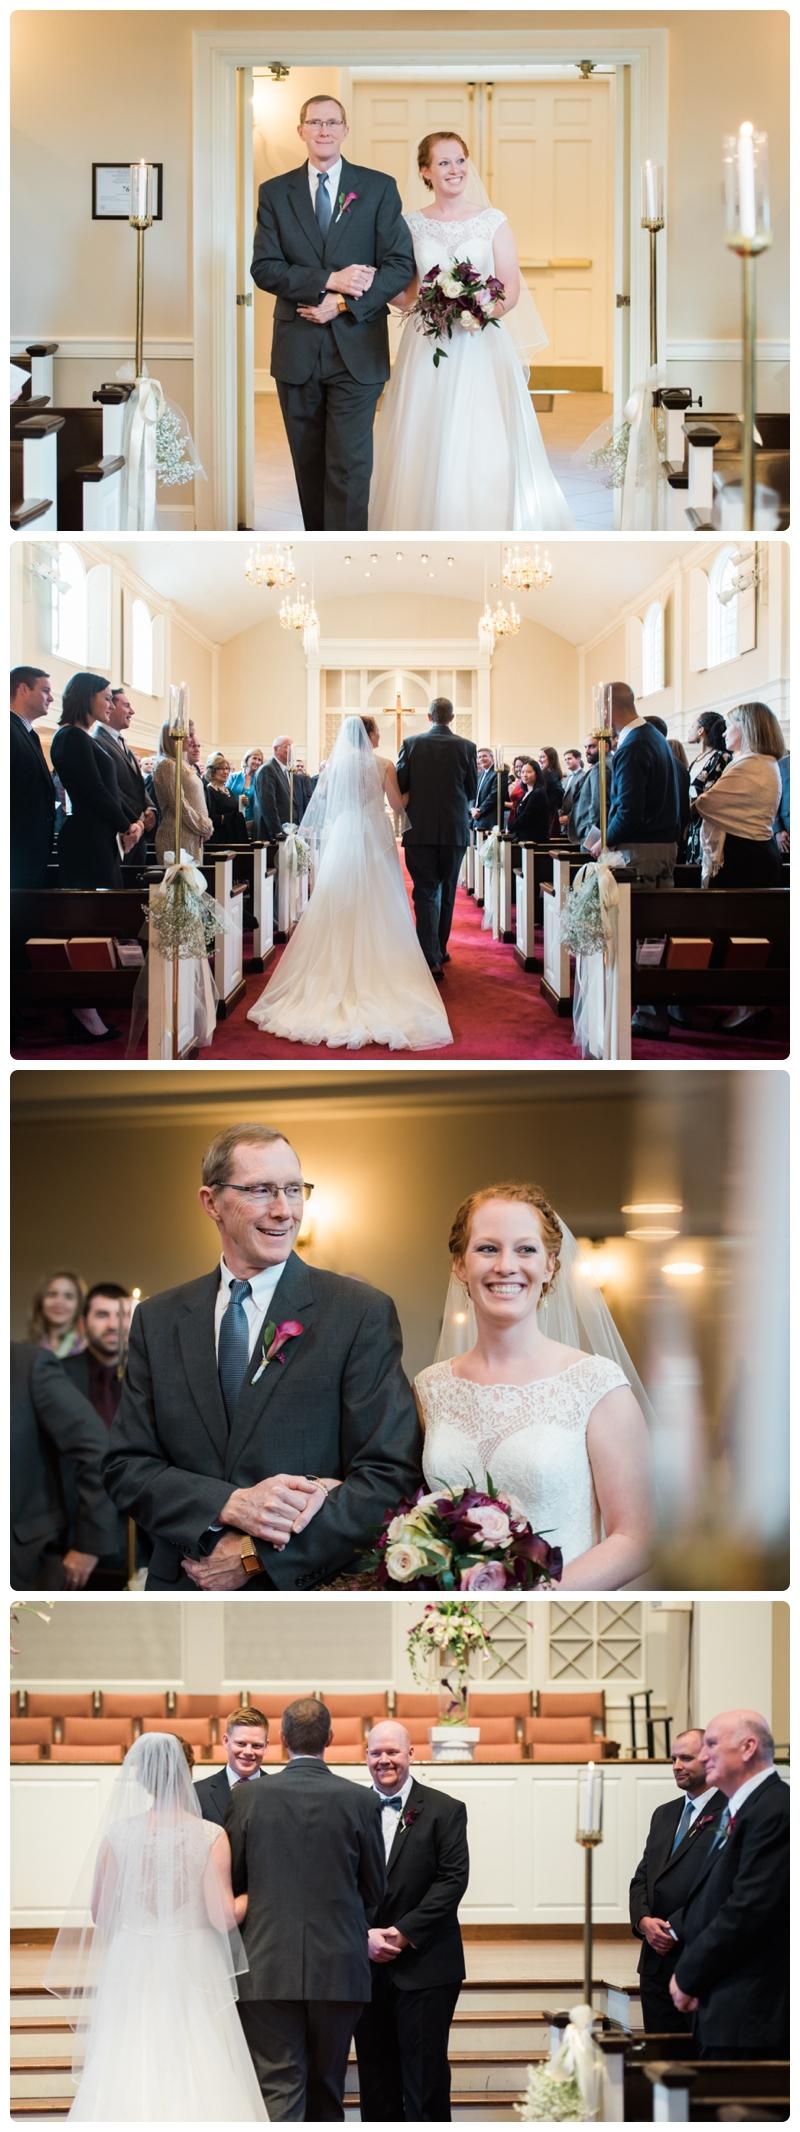 Wedding in Falls Church Virginia by Rachael Foster Photography_0017.jpg